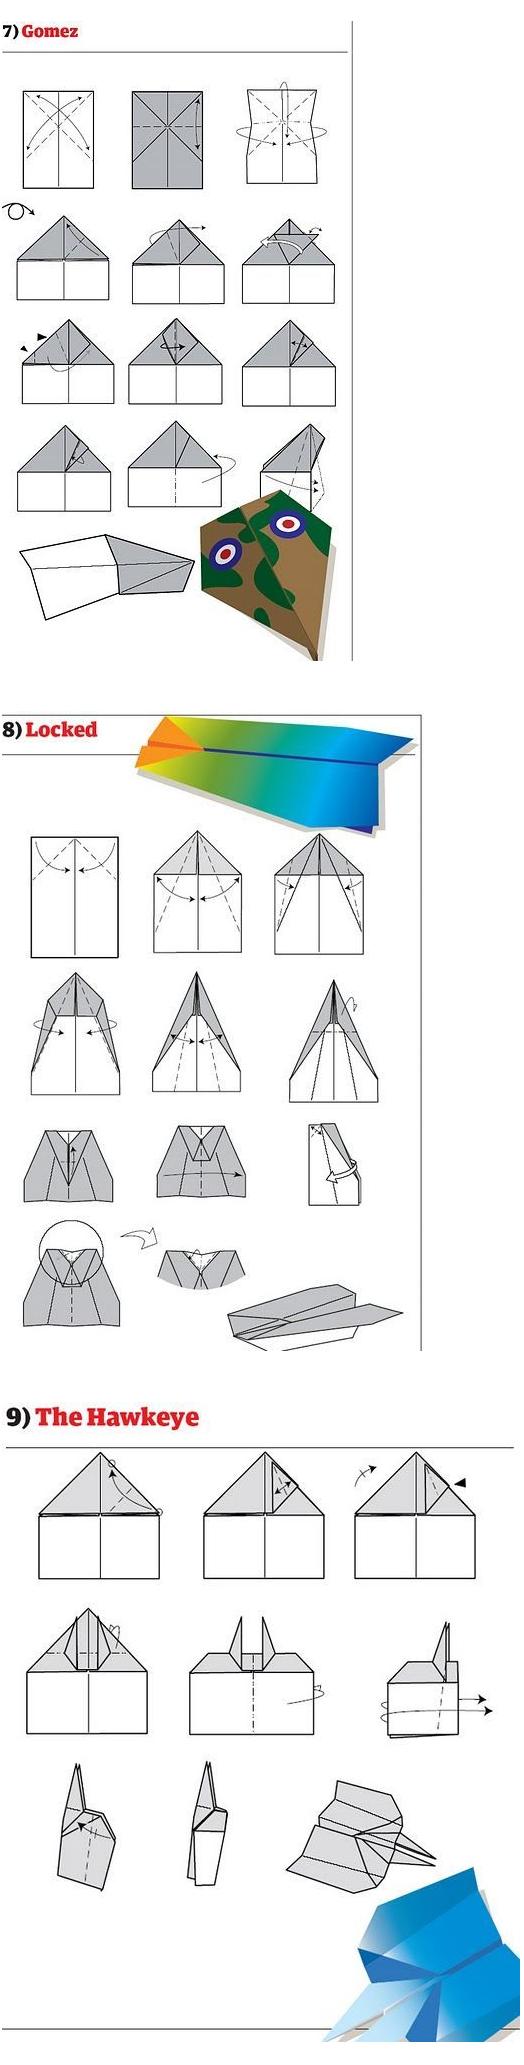 Оригами из бумаги чашку